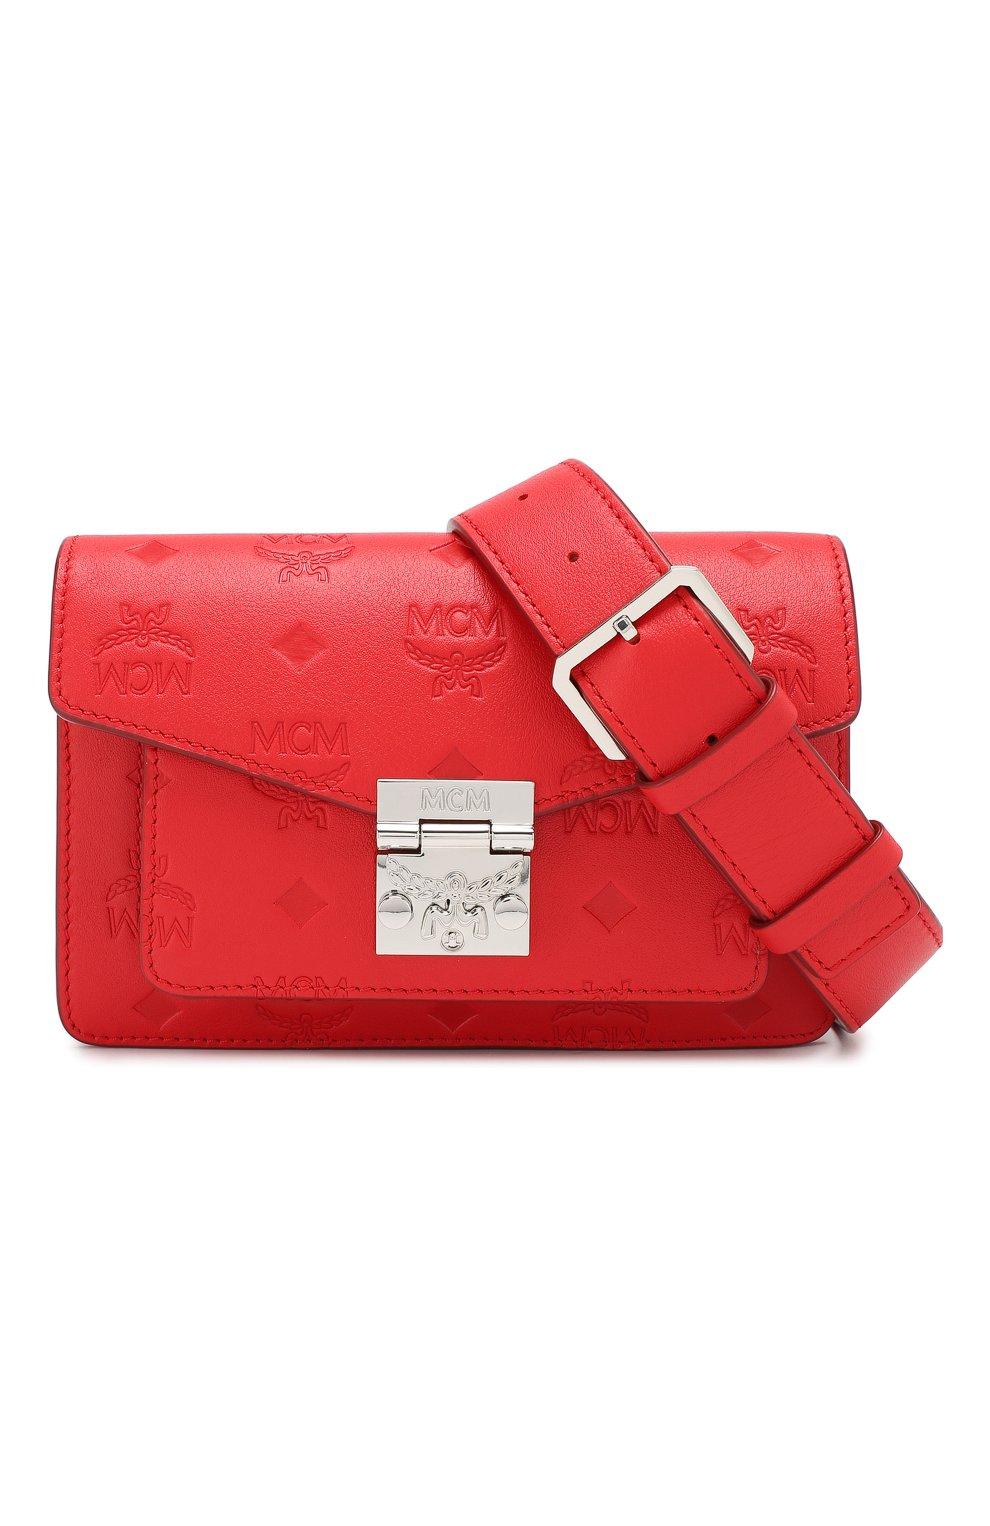 Поясная сумка Patricia | Фото №7